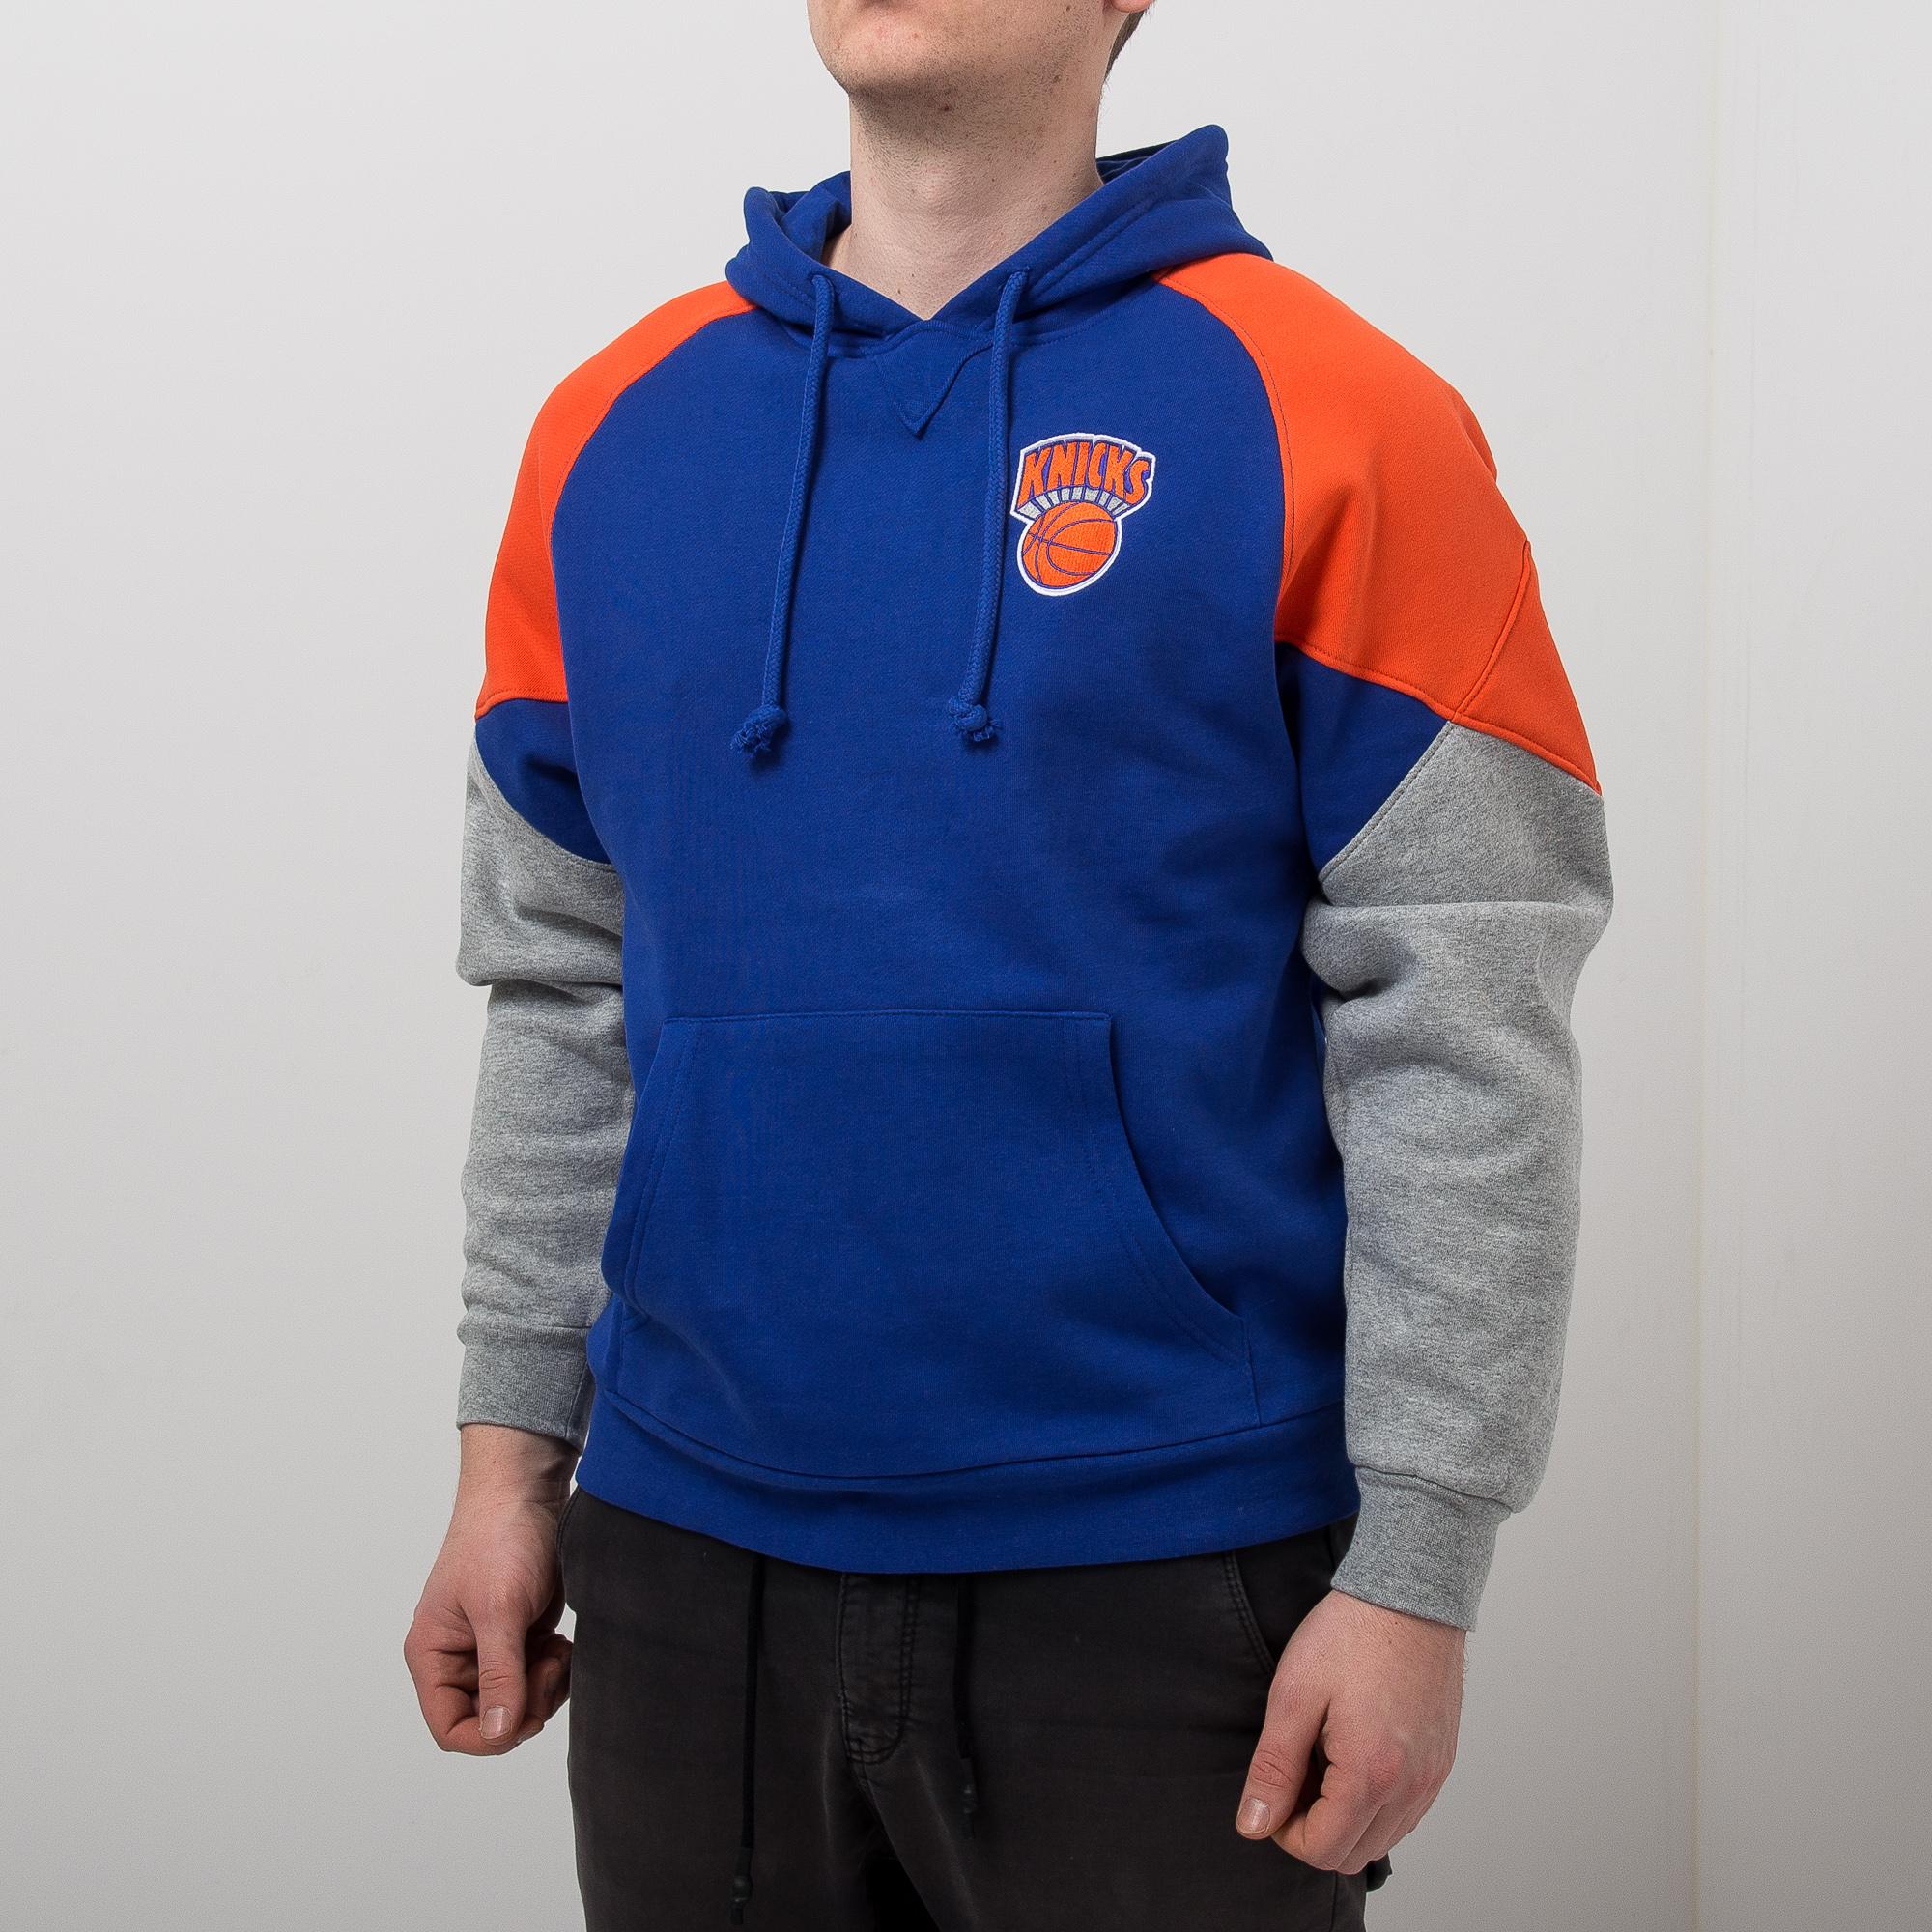 lowest price 10083 ca072 Mitchell & Ness NBA New York Knicks Trading Block Hoodie ...